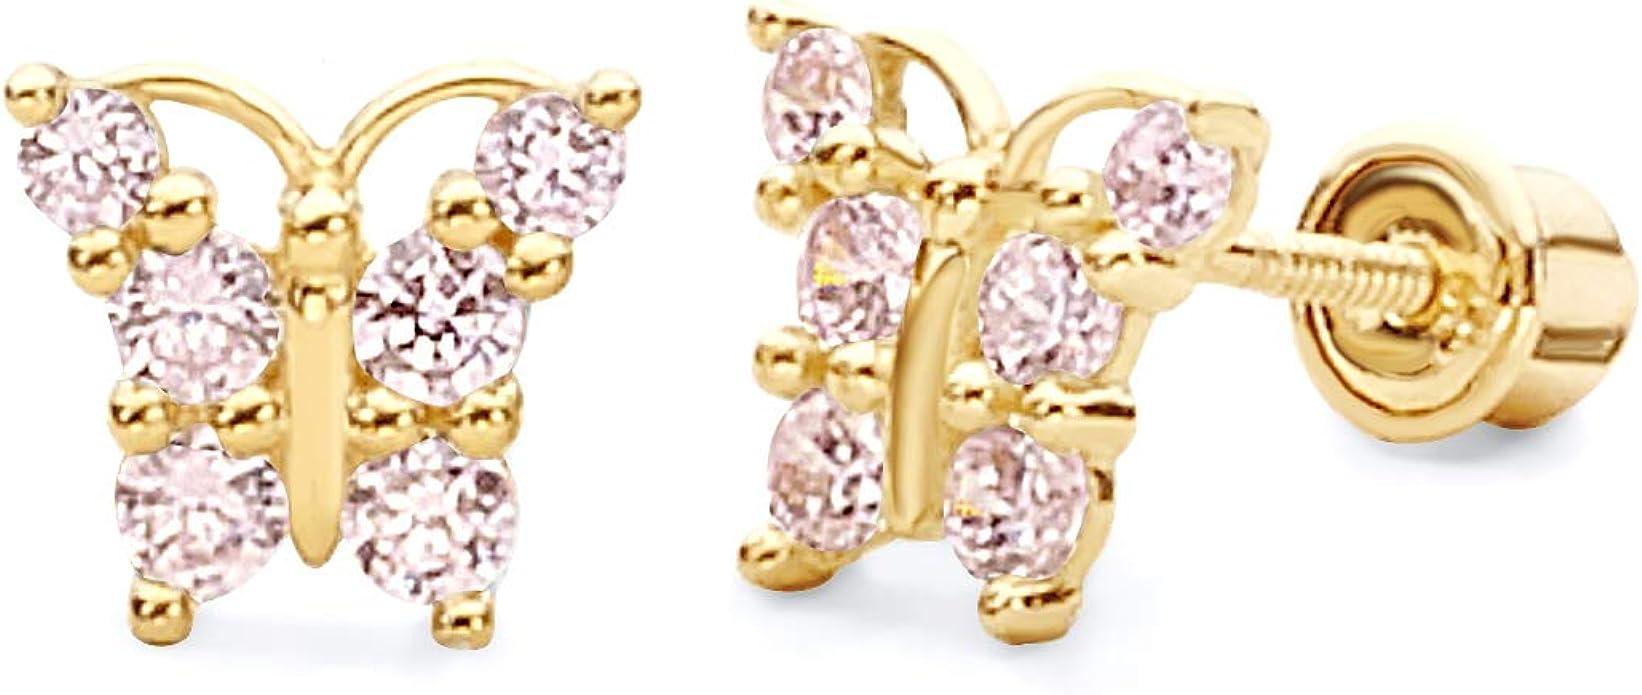 Wellingsale 14K Yellow Gold Polished Butterfly Stud Earrings With Screw Back